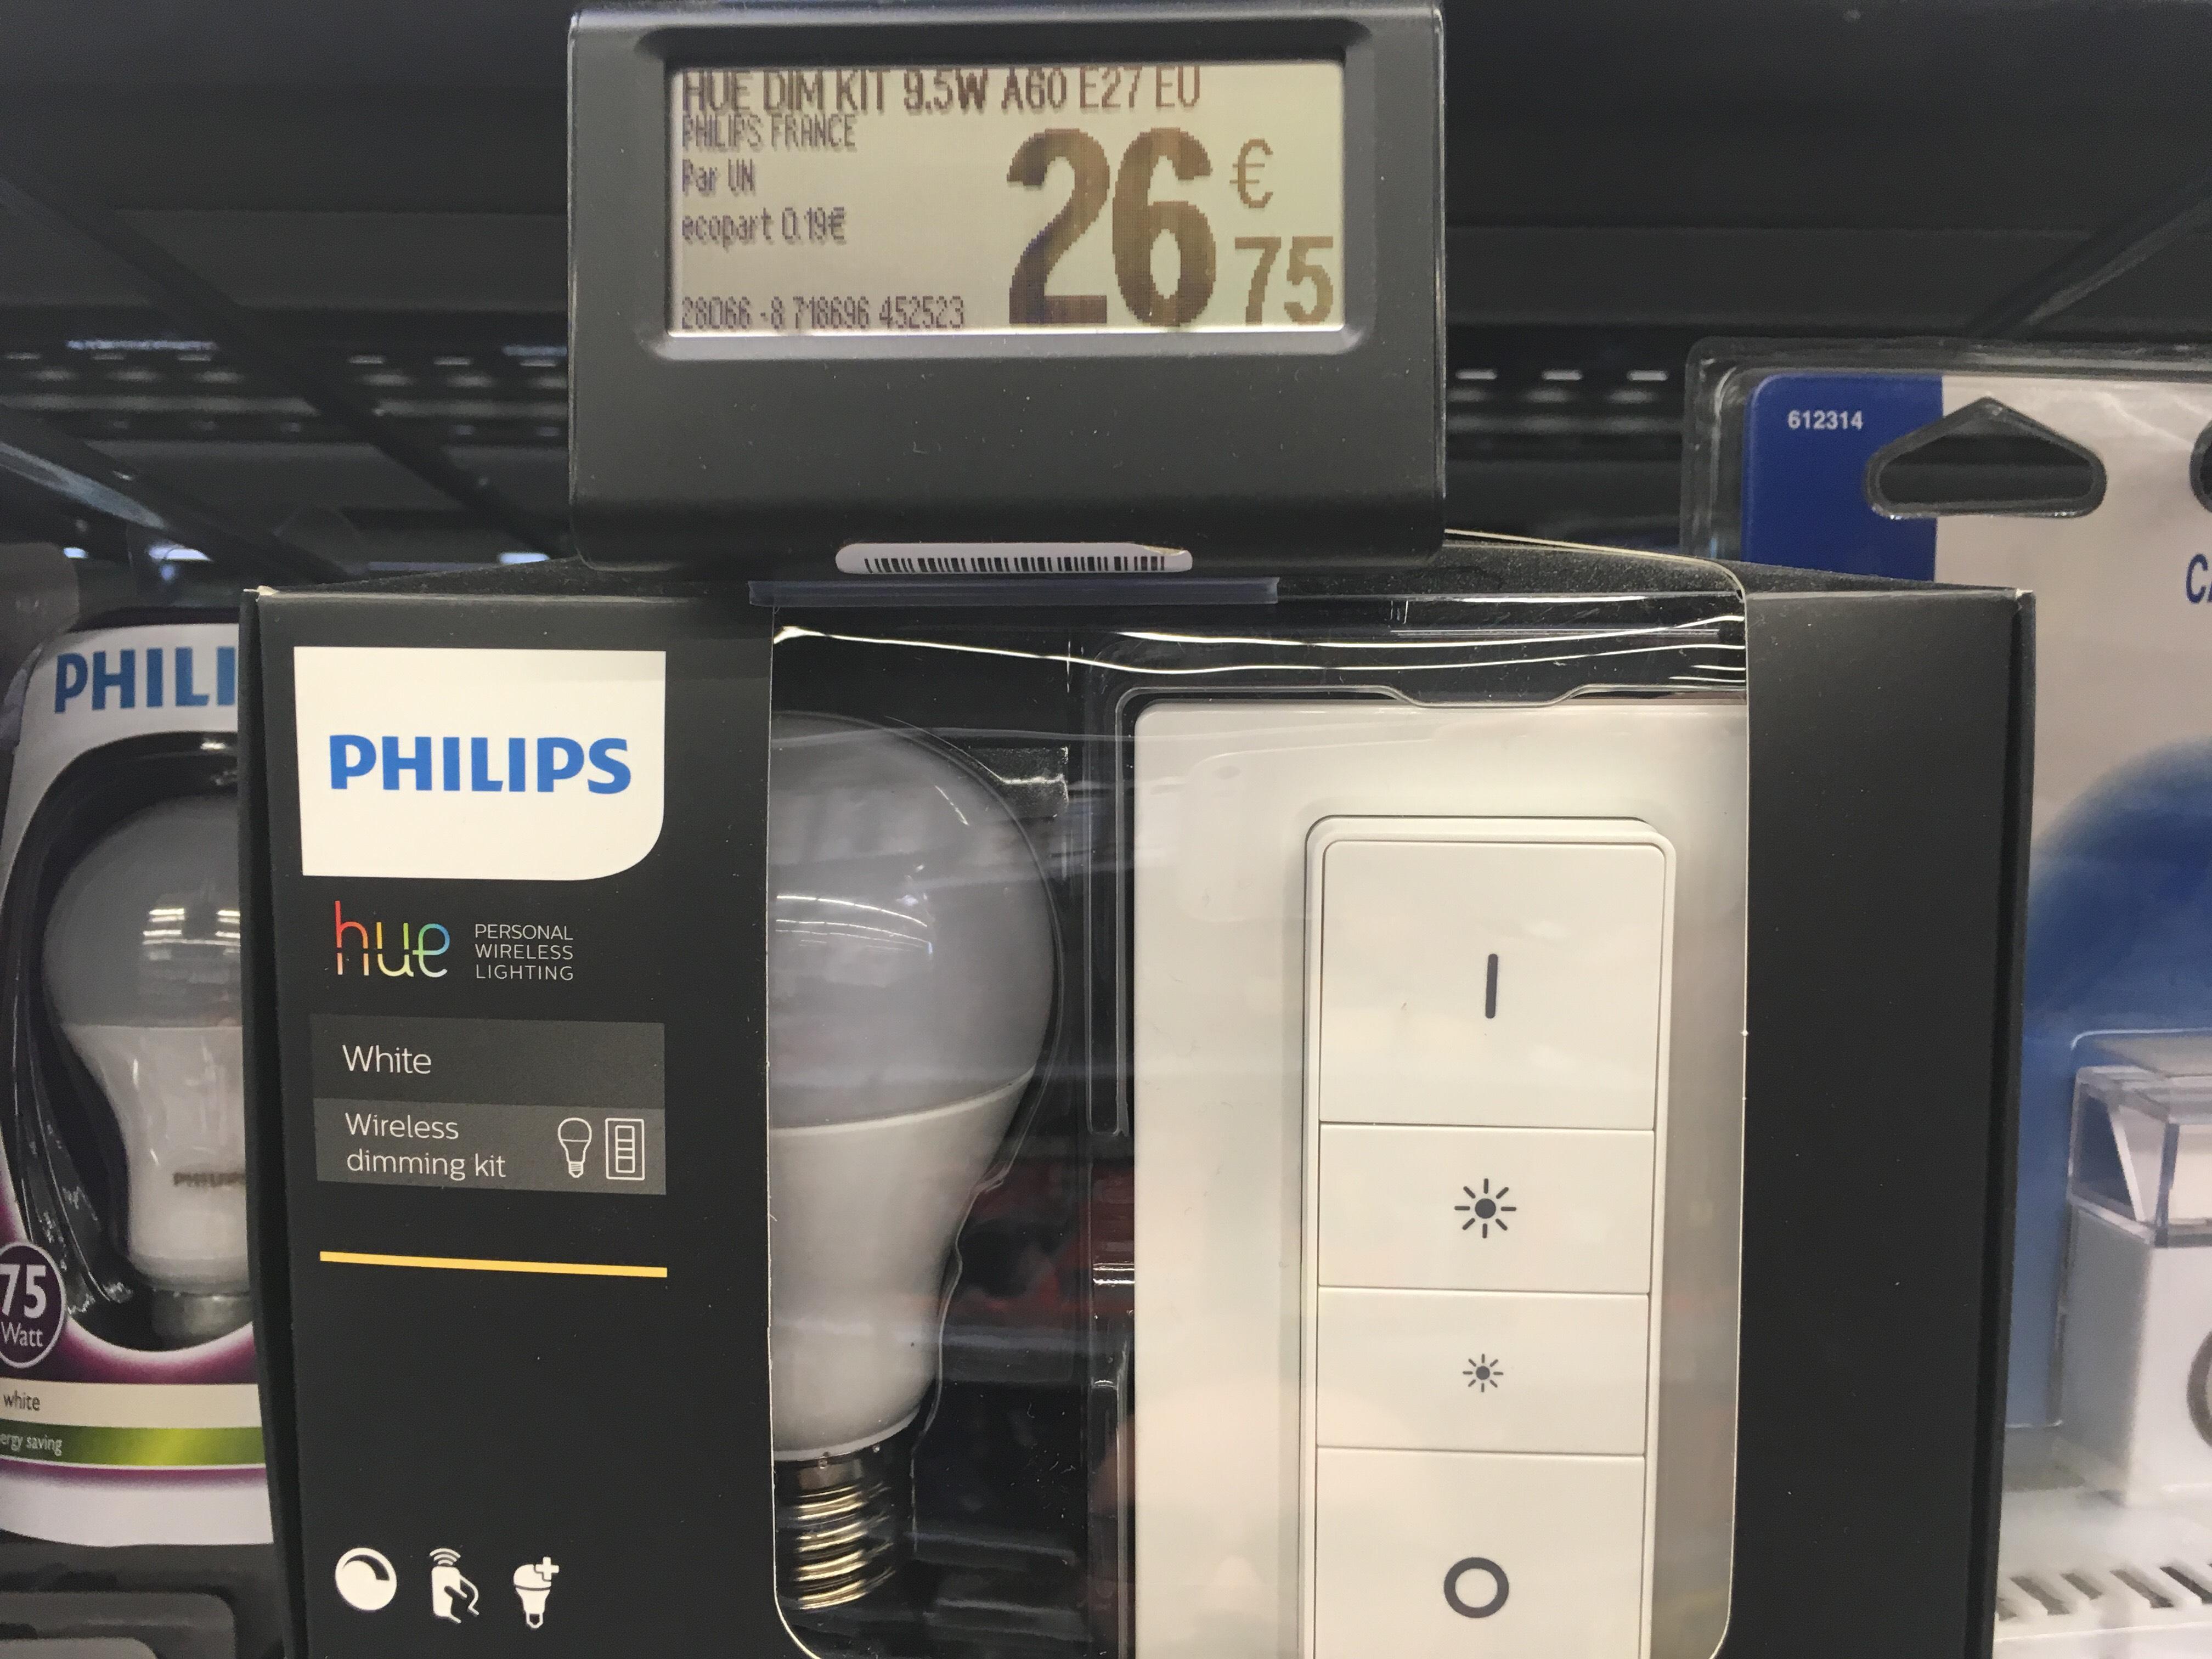 Kit d'ampoule LED connectée Philips Hue Wireless Dimming